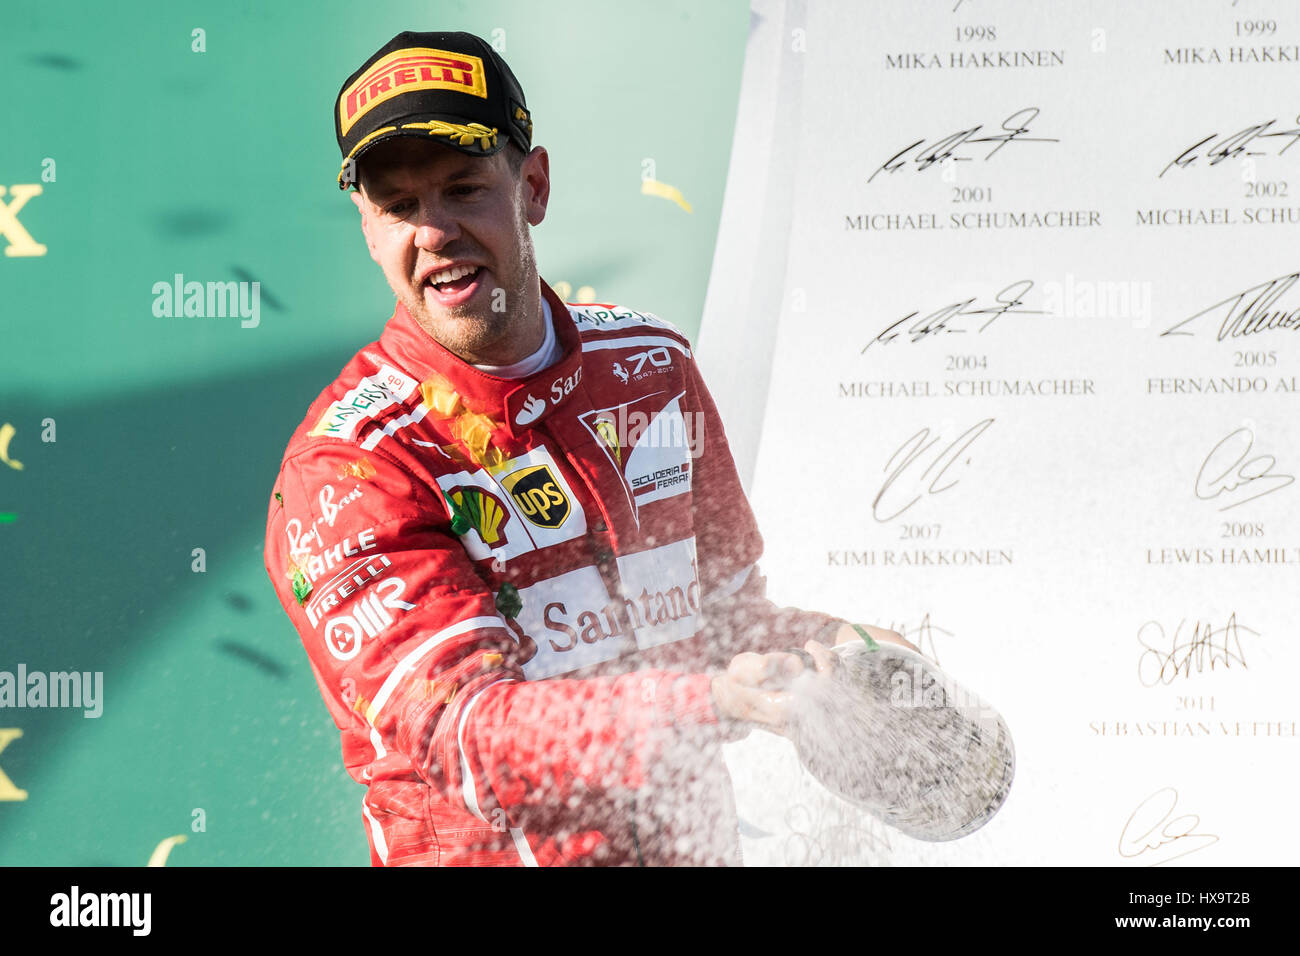 Melbourne, Australia. 26 Mar, 2017. Scuderia Ferrari el piloto alemán Sebastian Vettel celebra durante la ceremonia Foto de stock